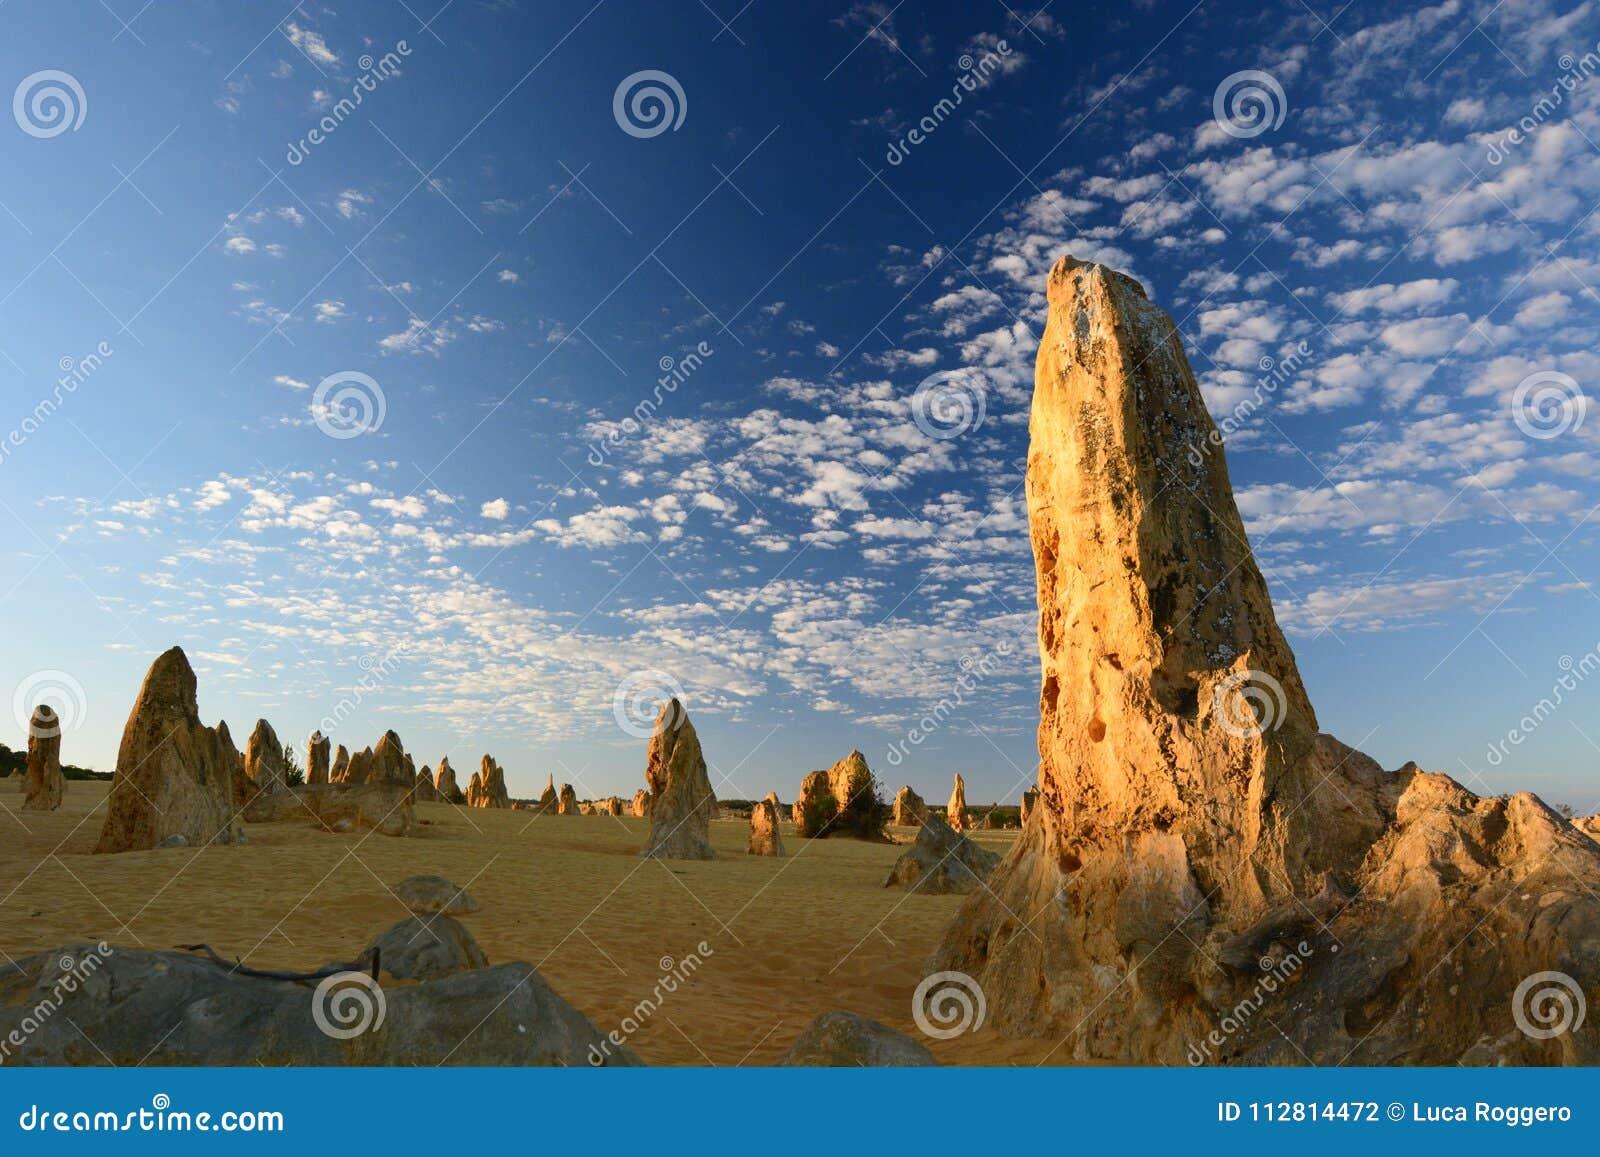 Sunrise in Pinnacles desert. Nambung national park. Cervantes. Western Australia. Australia